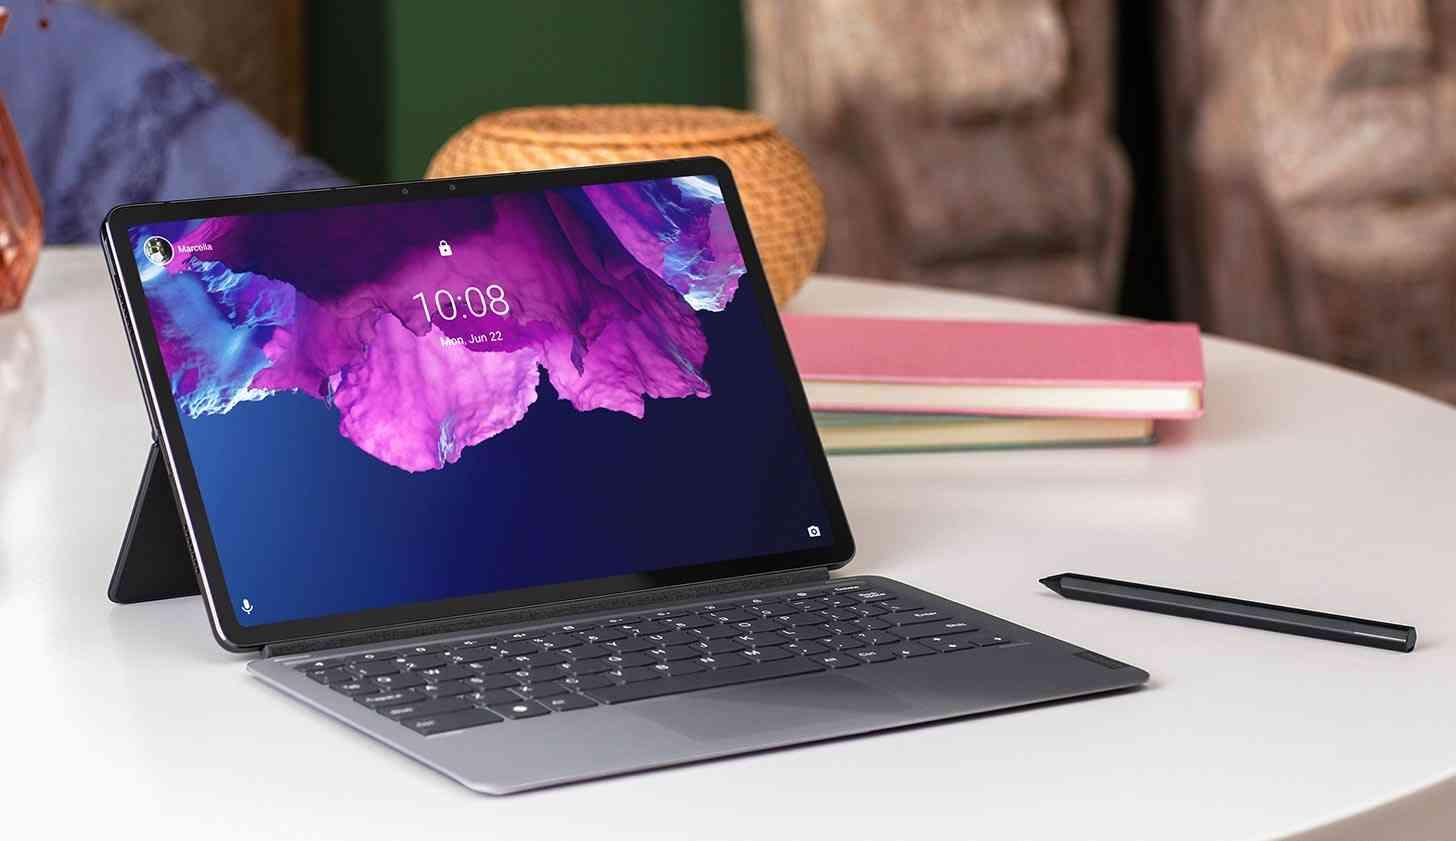 Lenovo Tab P11 Pro keyboard, stylus